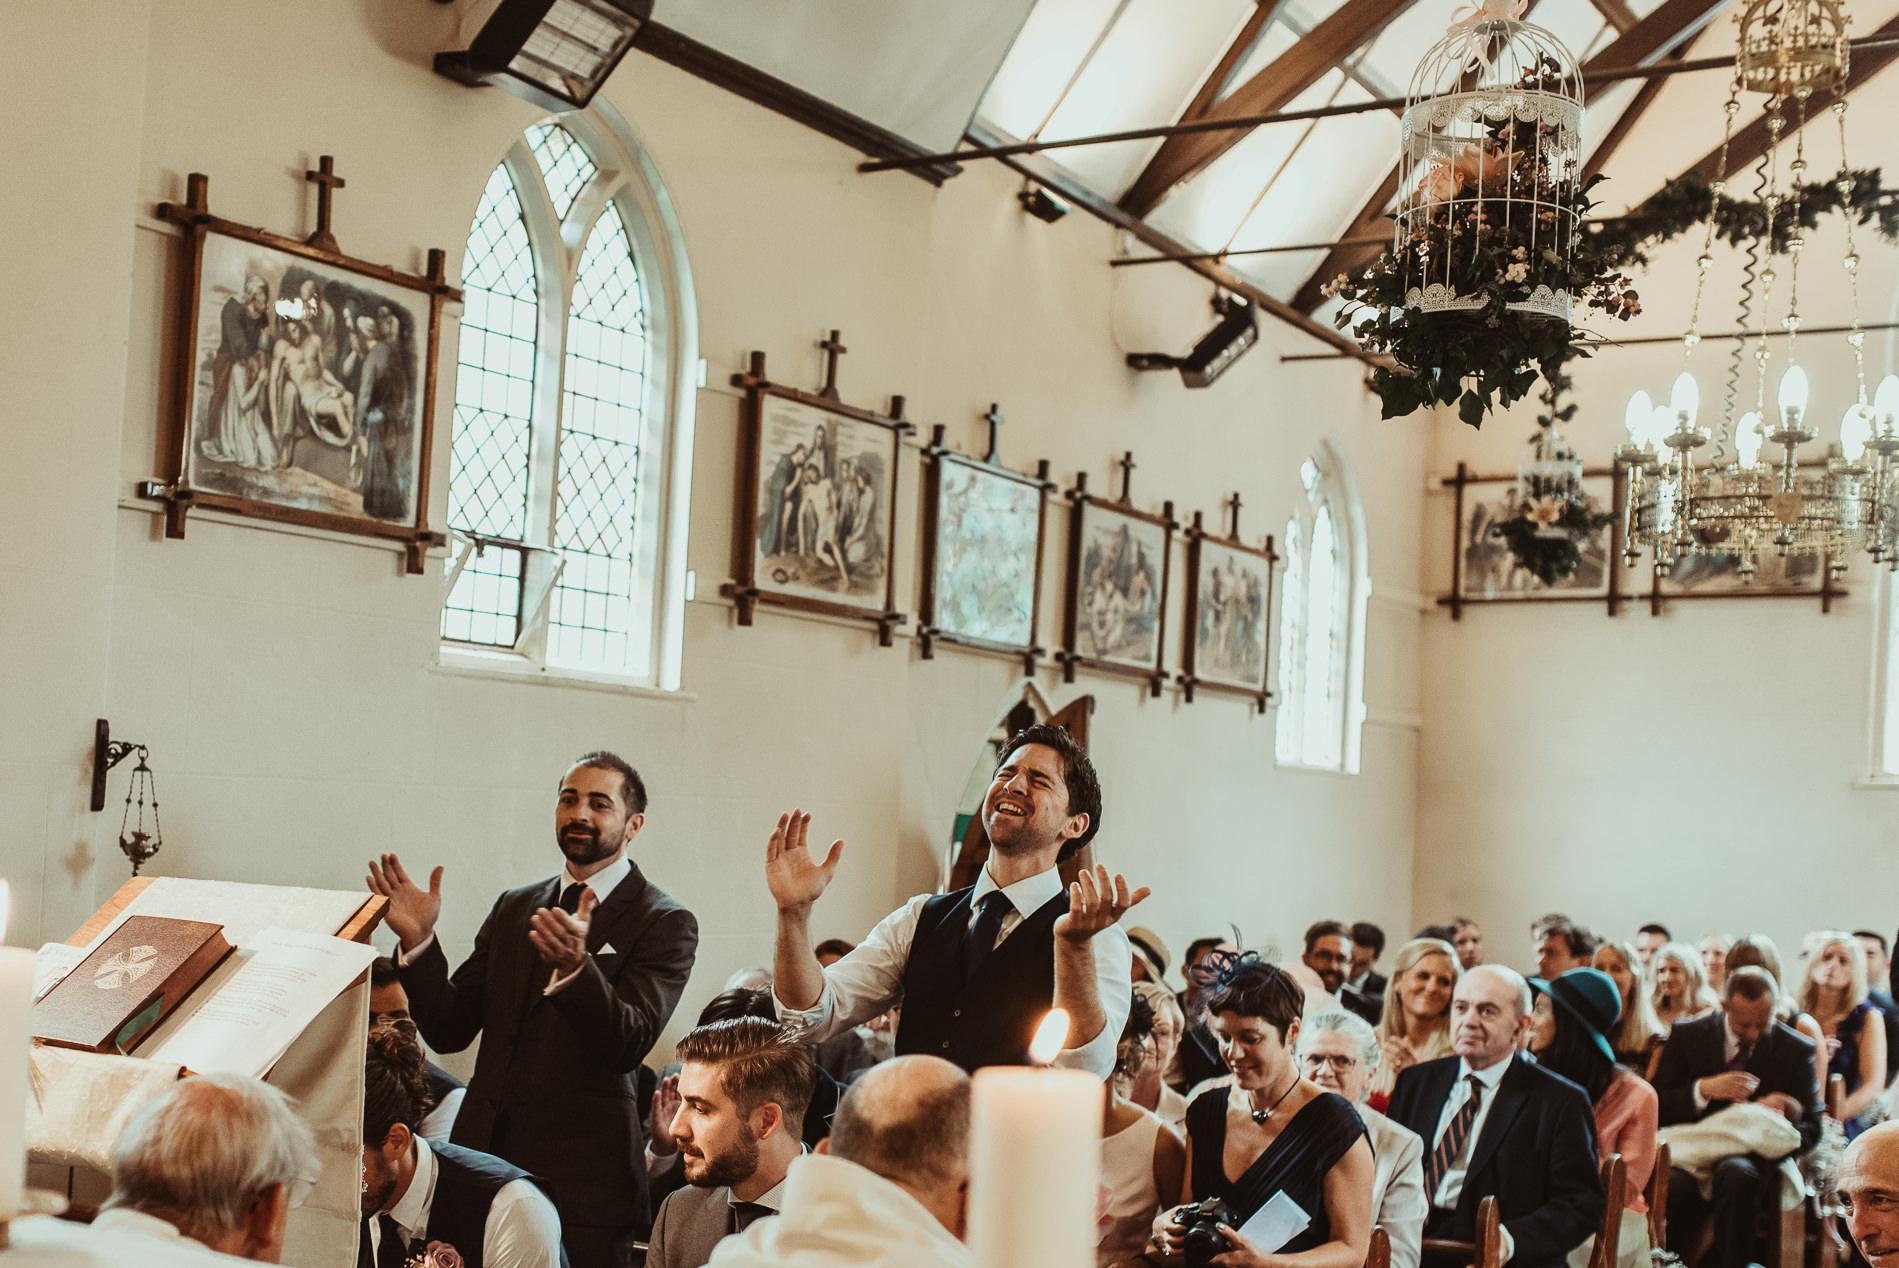 bohemian_wedding_lawshall_church_garden40